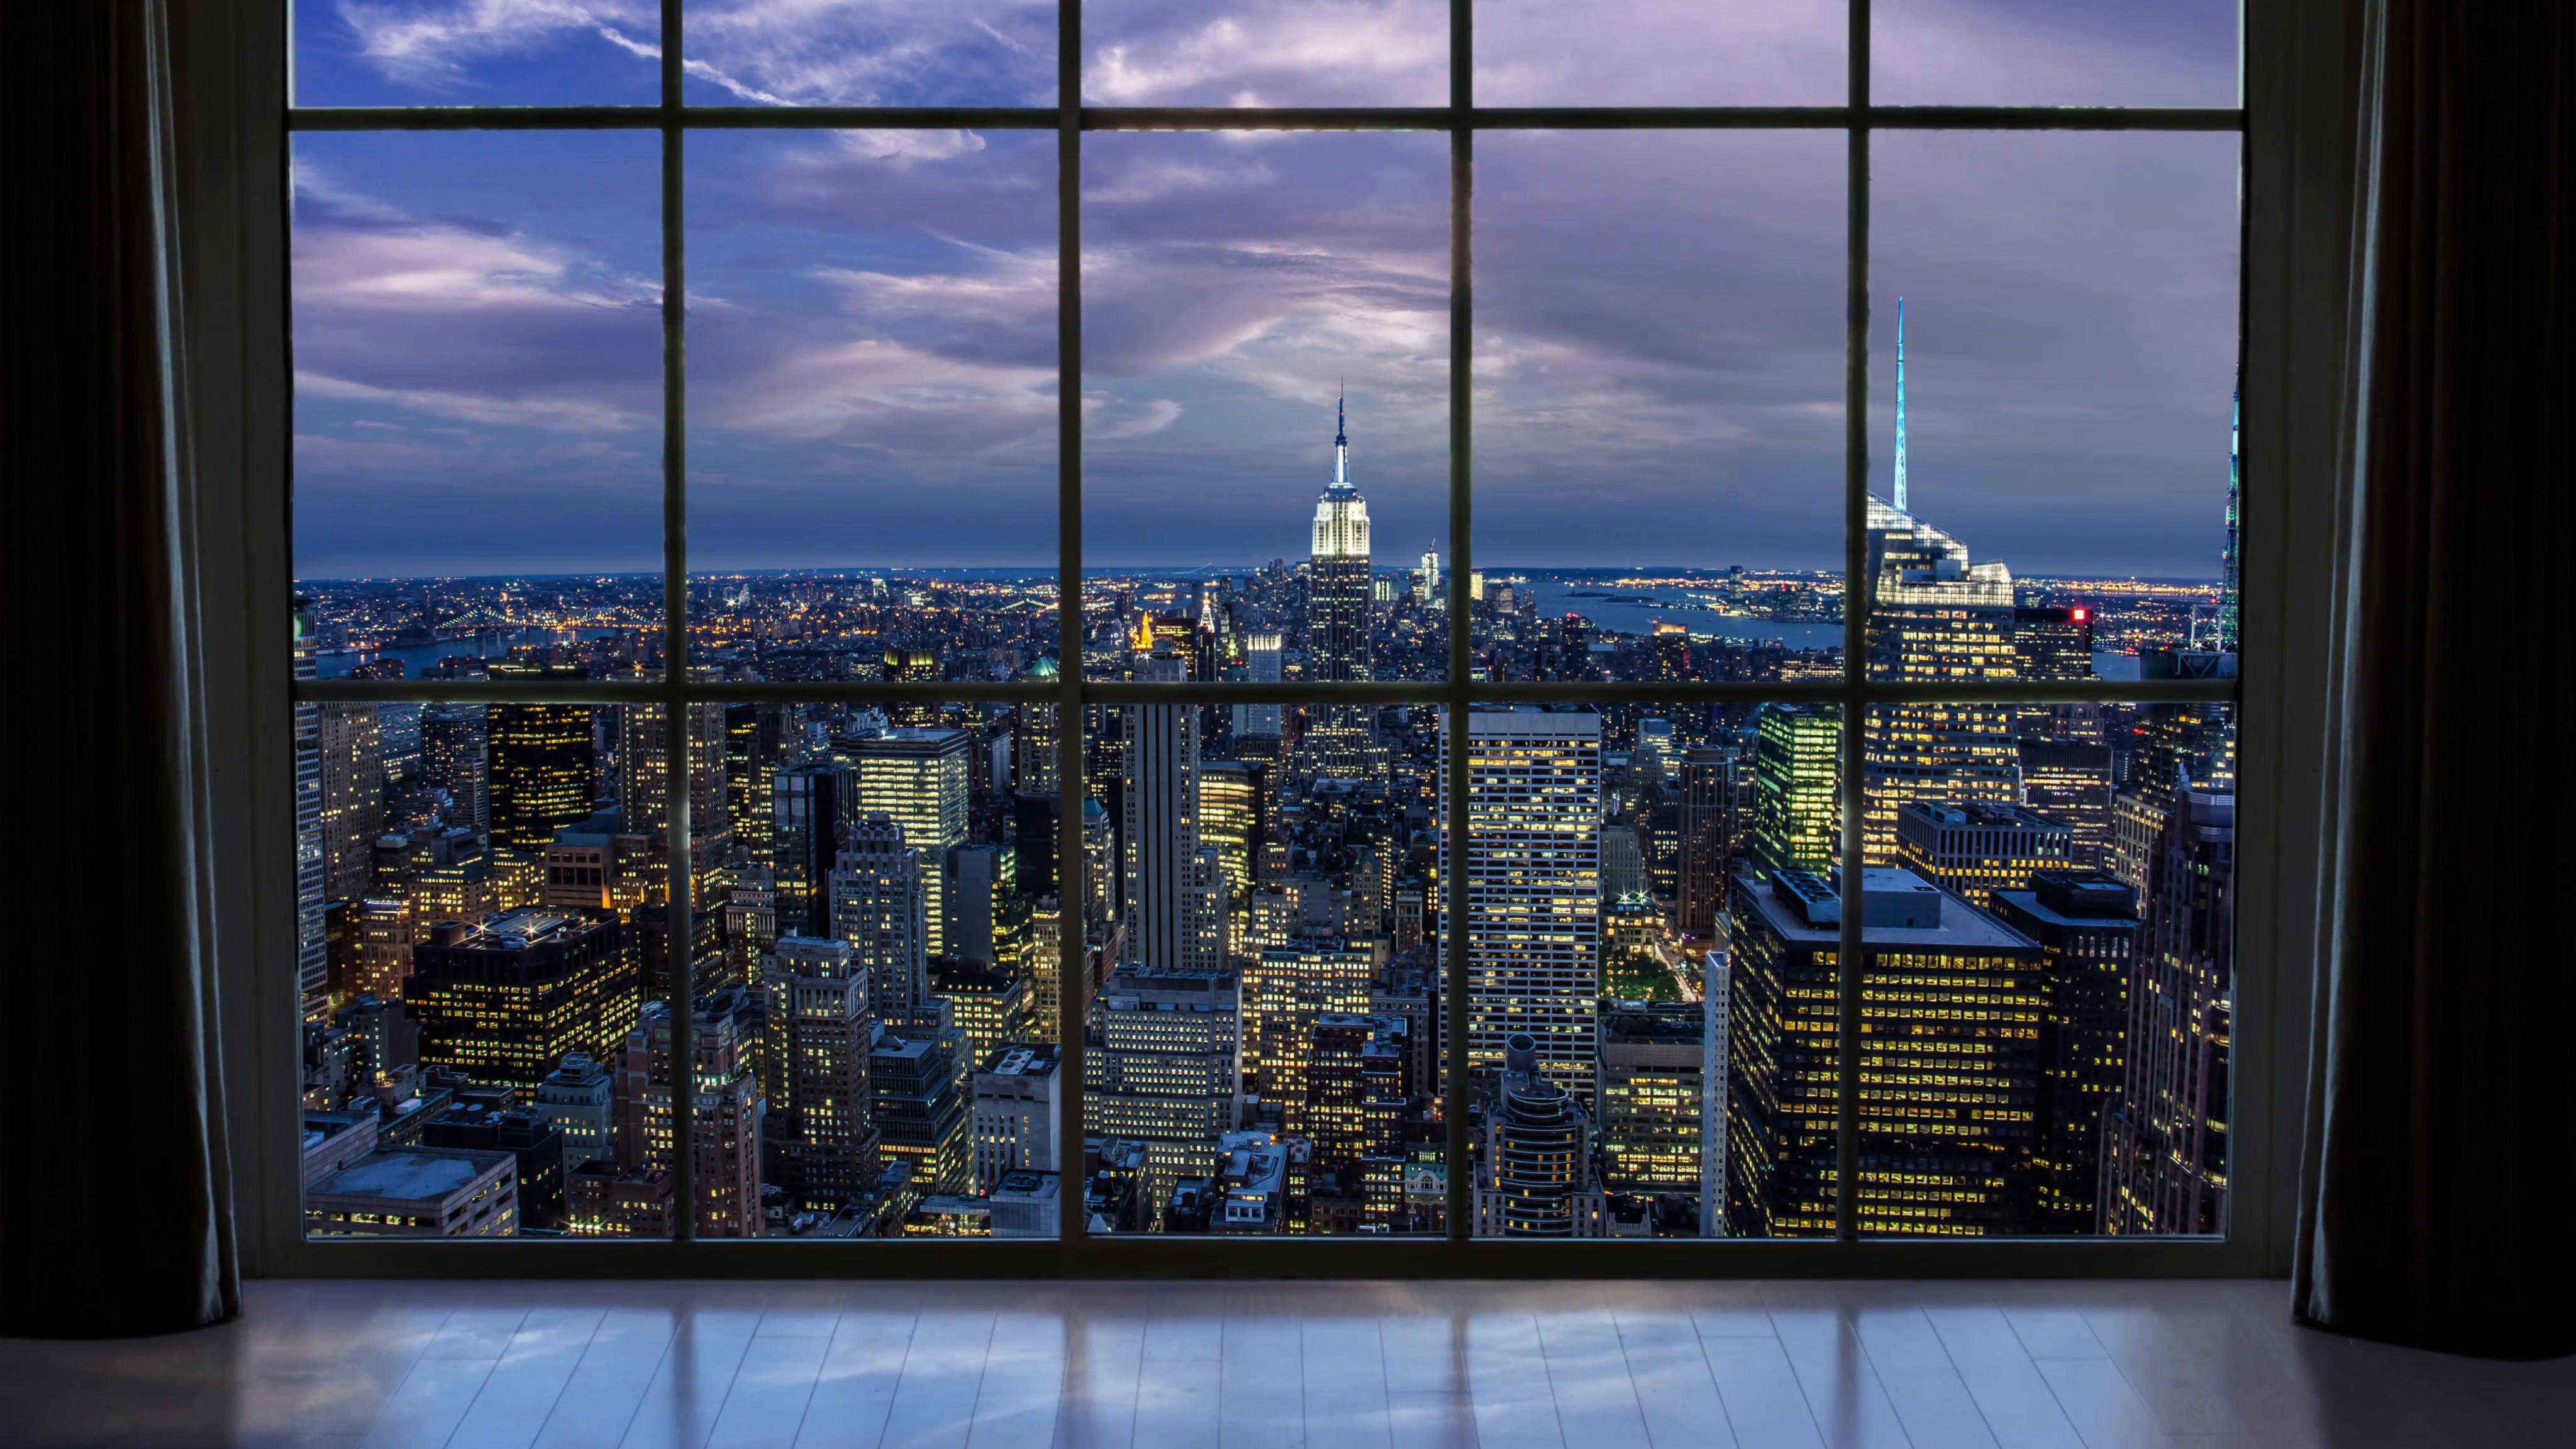 Free photo: City View - Architecture, Building, City ...